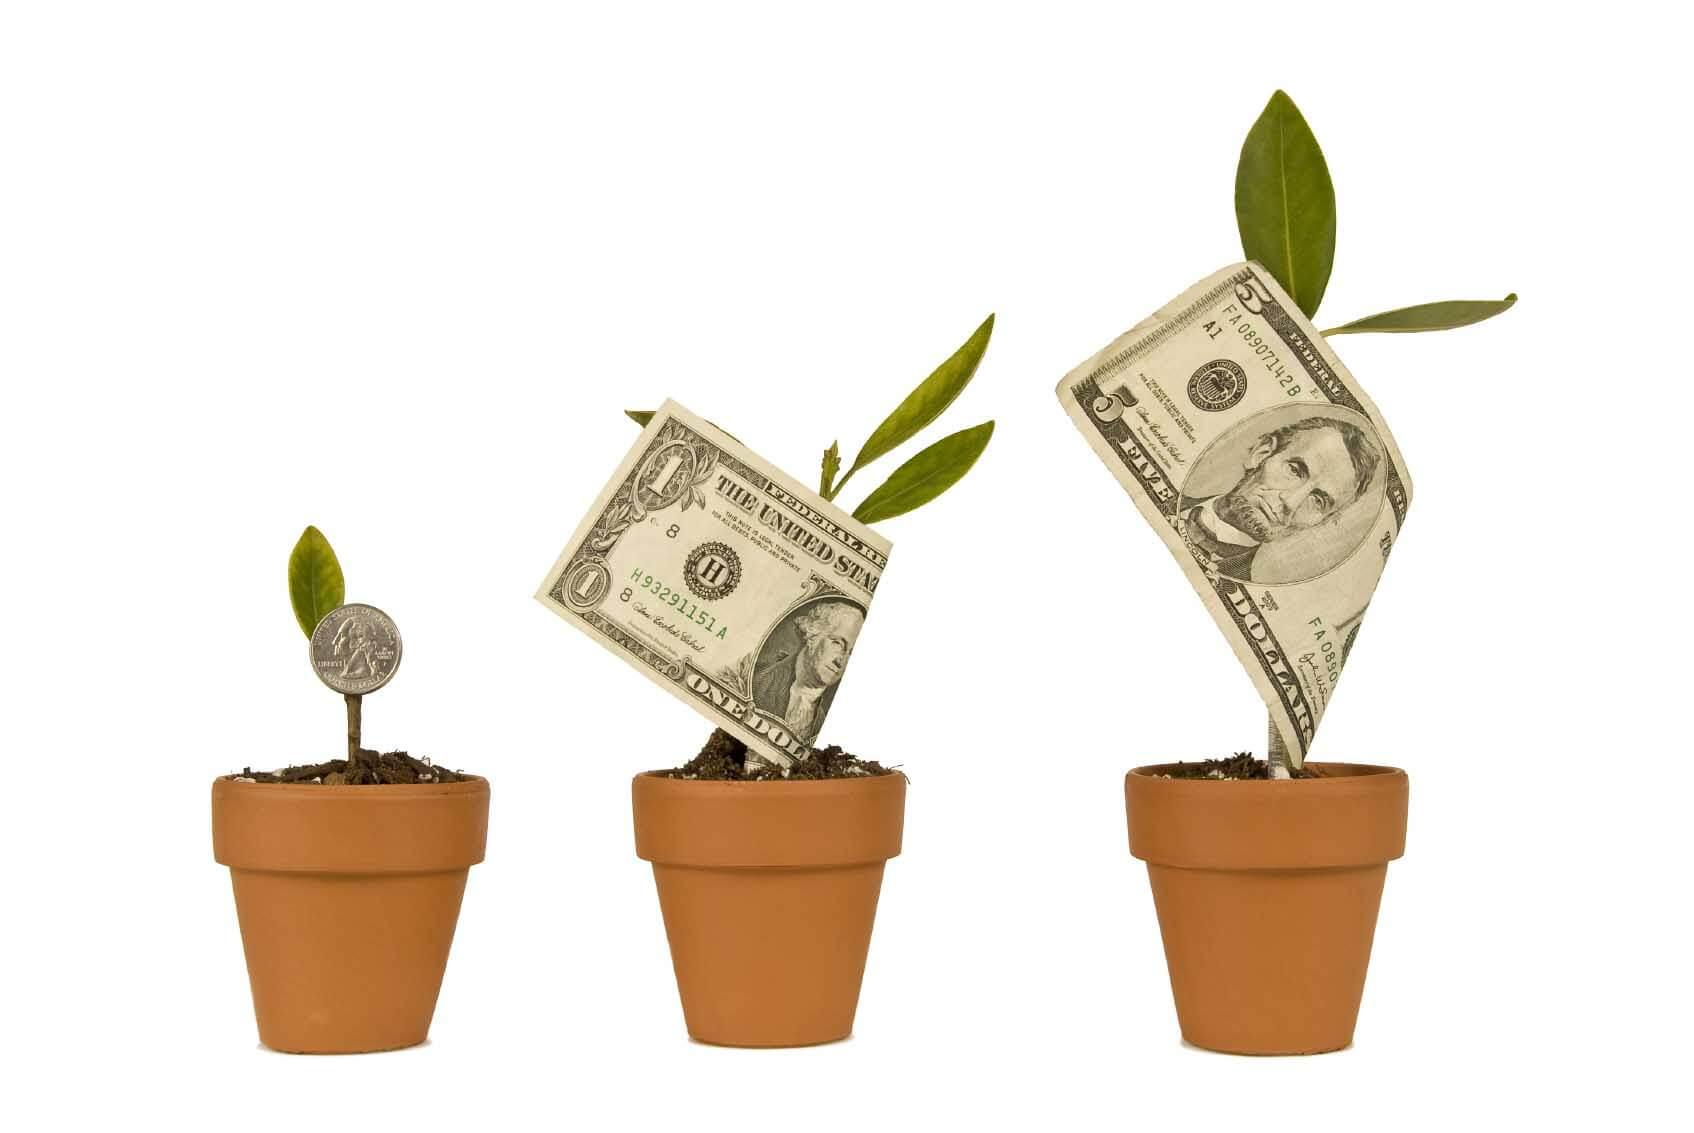 app development costs plants